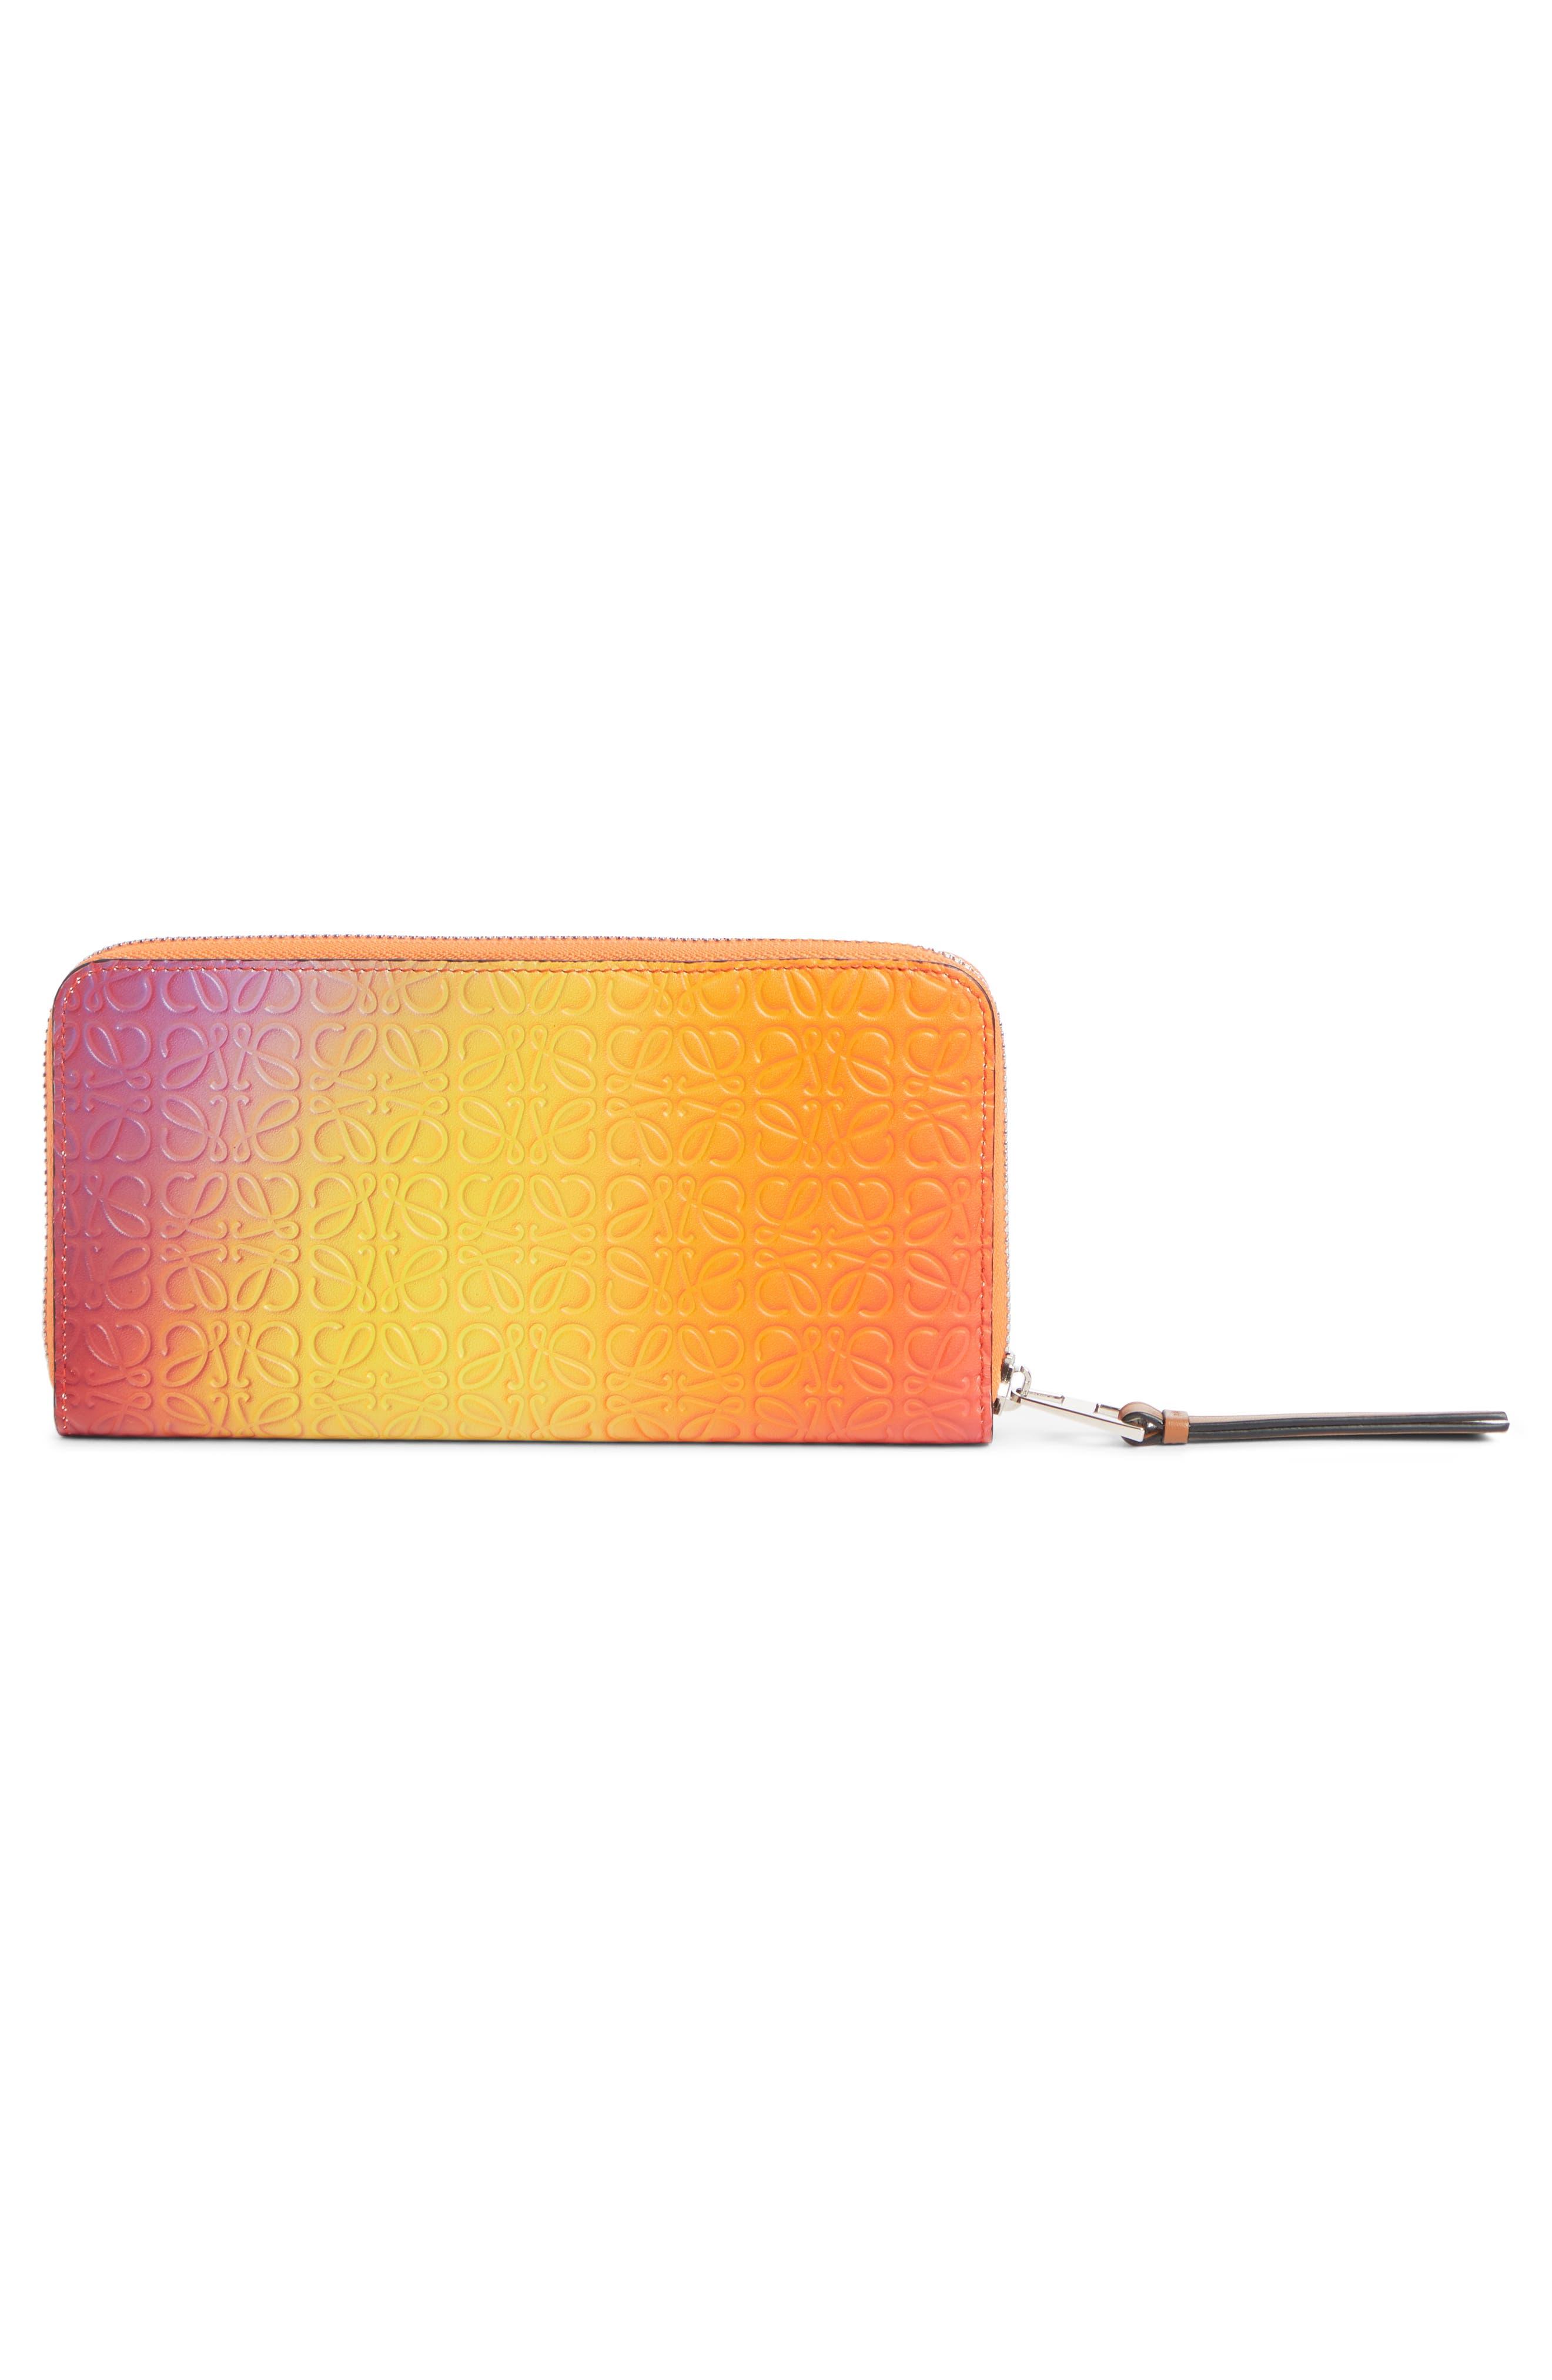 LOEWE,                             Embossed Ombré Leather Zip Around Wallet,                             Alternate thumbnail 3, color,                             ORANGE SUNSET